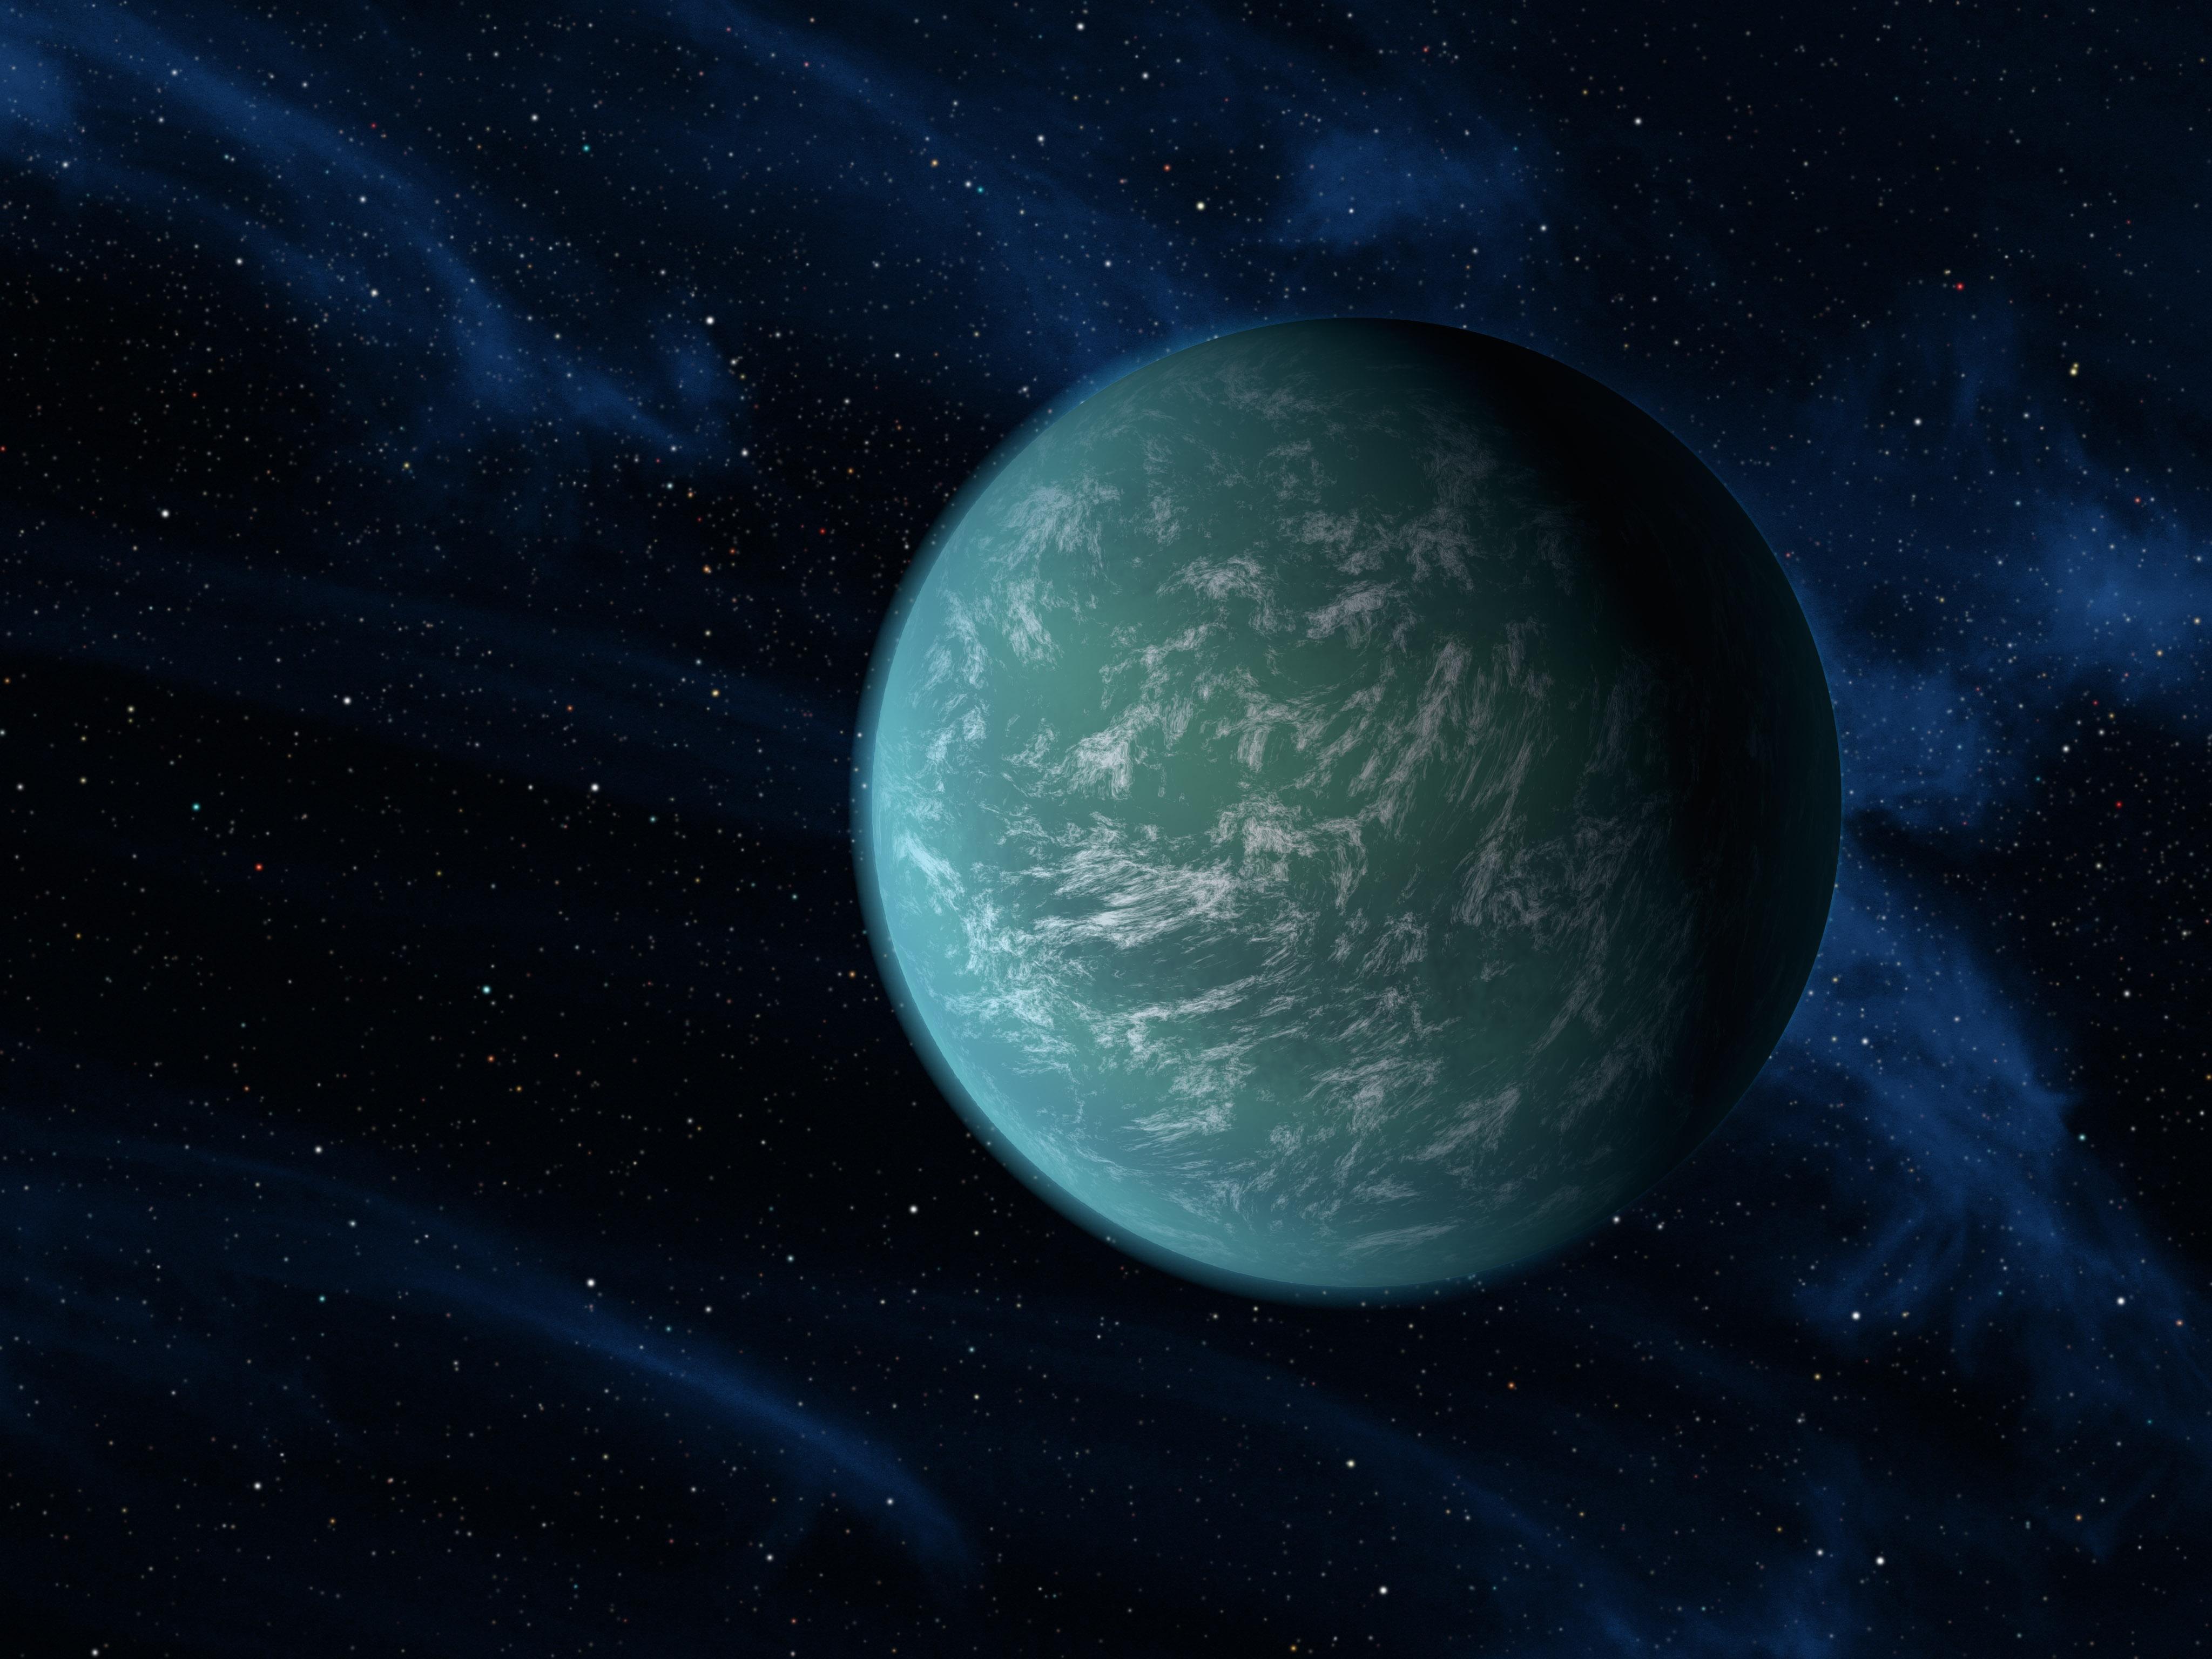 earth like planets kepler 22b -#main